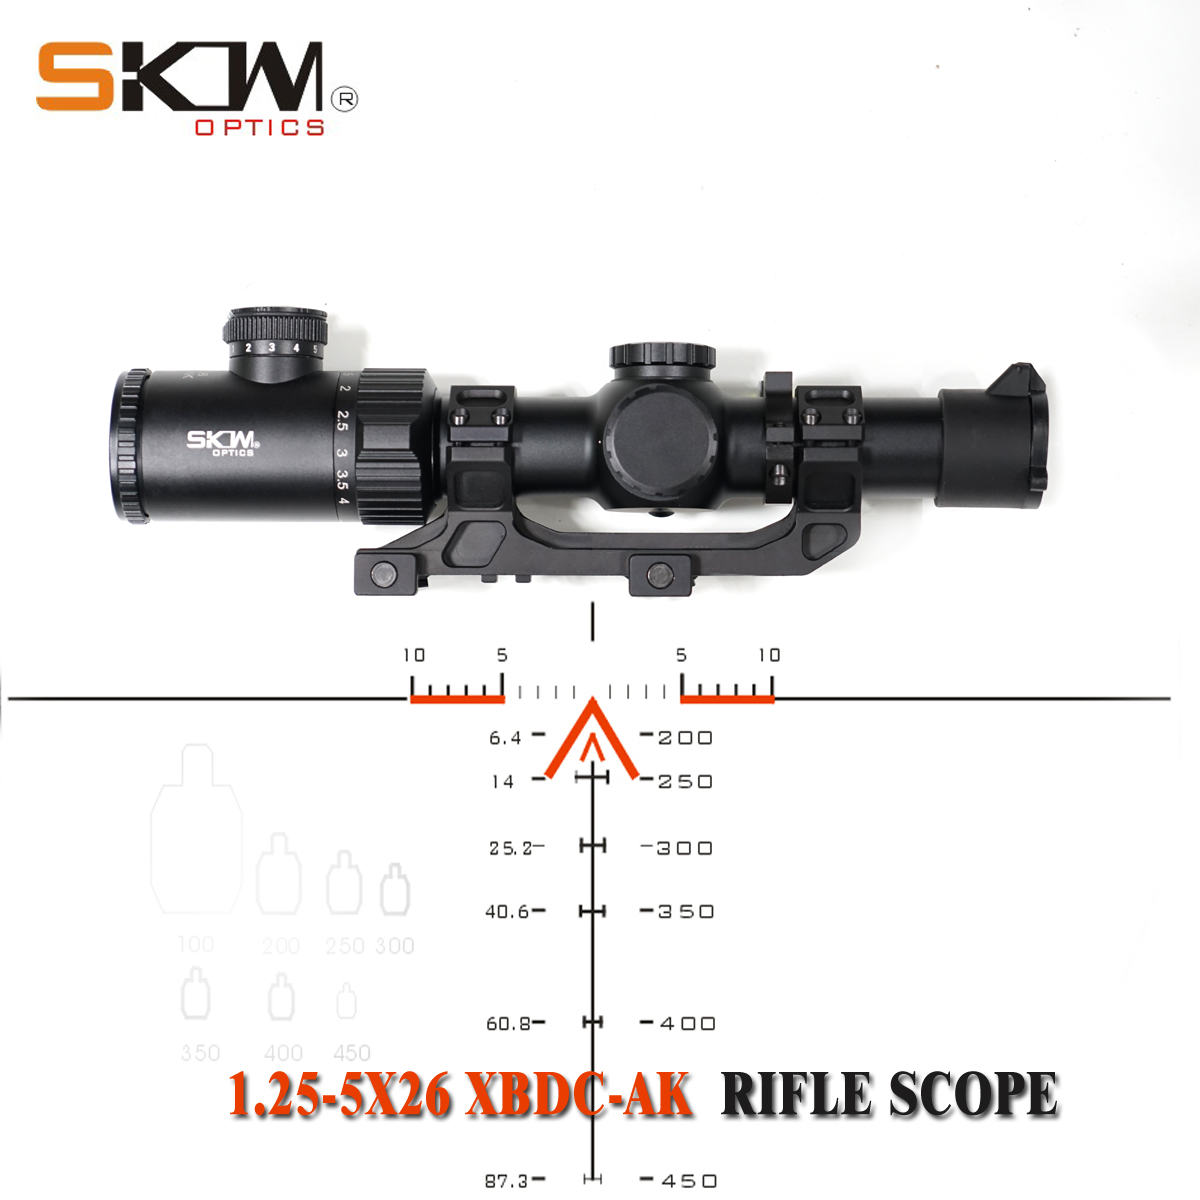 SKWoptics 1.25-5x26A Tactical Riflescopes Hunting For AK AR, M4 Kalashnikov Sight Rifle Scope BDC Reticle  30mm One Piece Mount